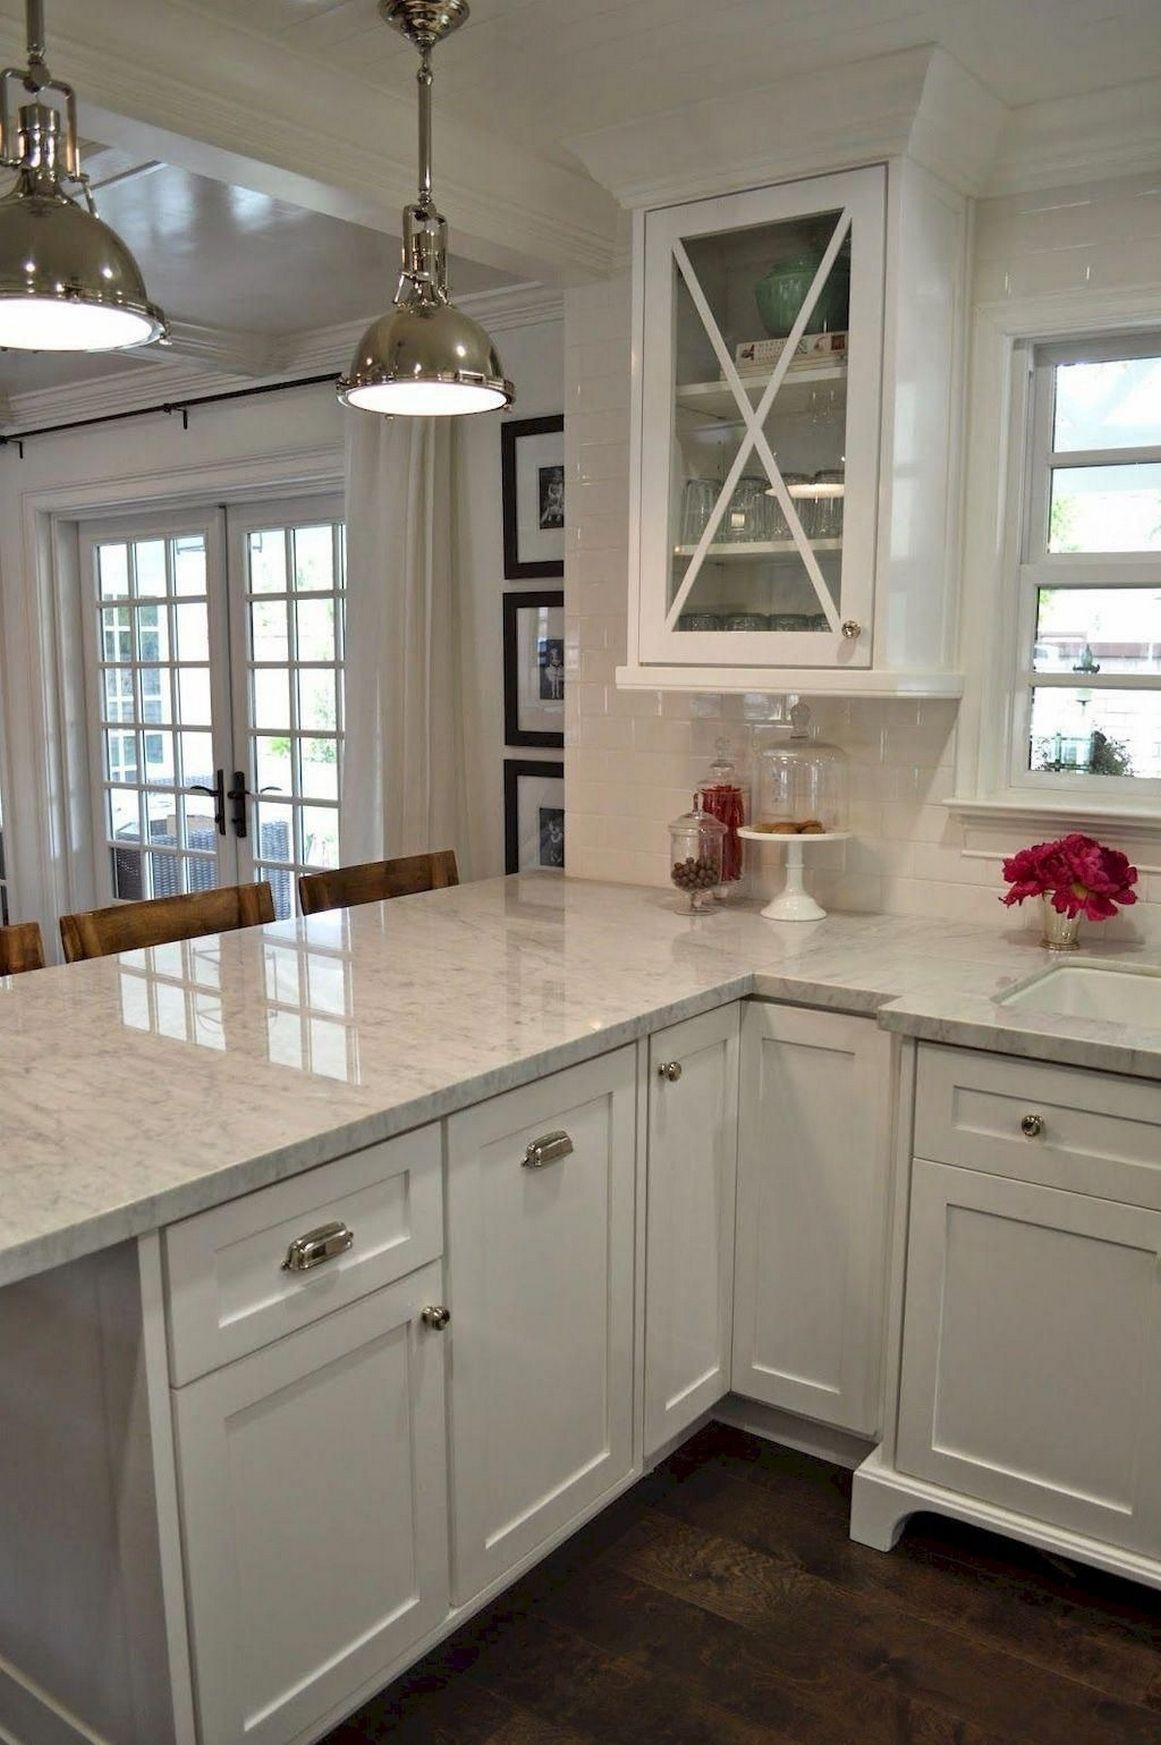 Kitchen Design Plans Tips On 86 Small Kitchen Designs Ideas Kitchen Remodel Small Kitchen Design Small Kitchen Design